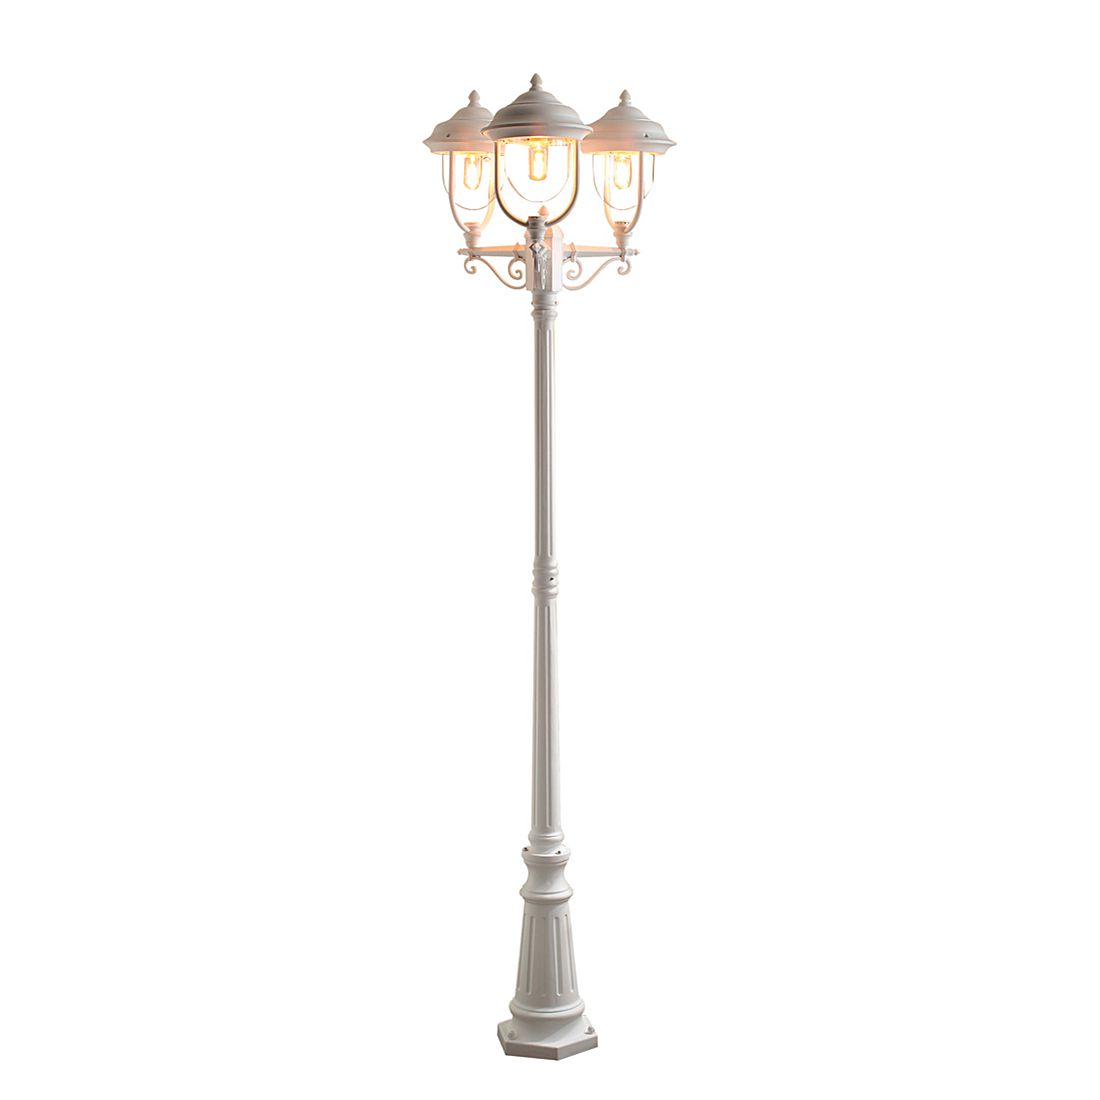 Standleuchte Parma ● Aluminium/Glas ● 3-flammig- Konstsmide A++